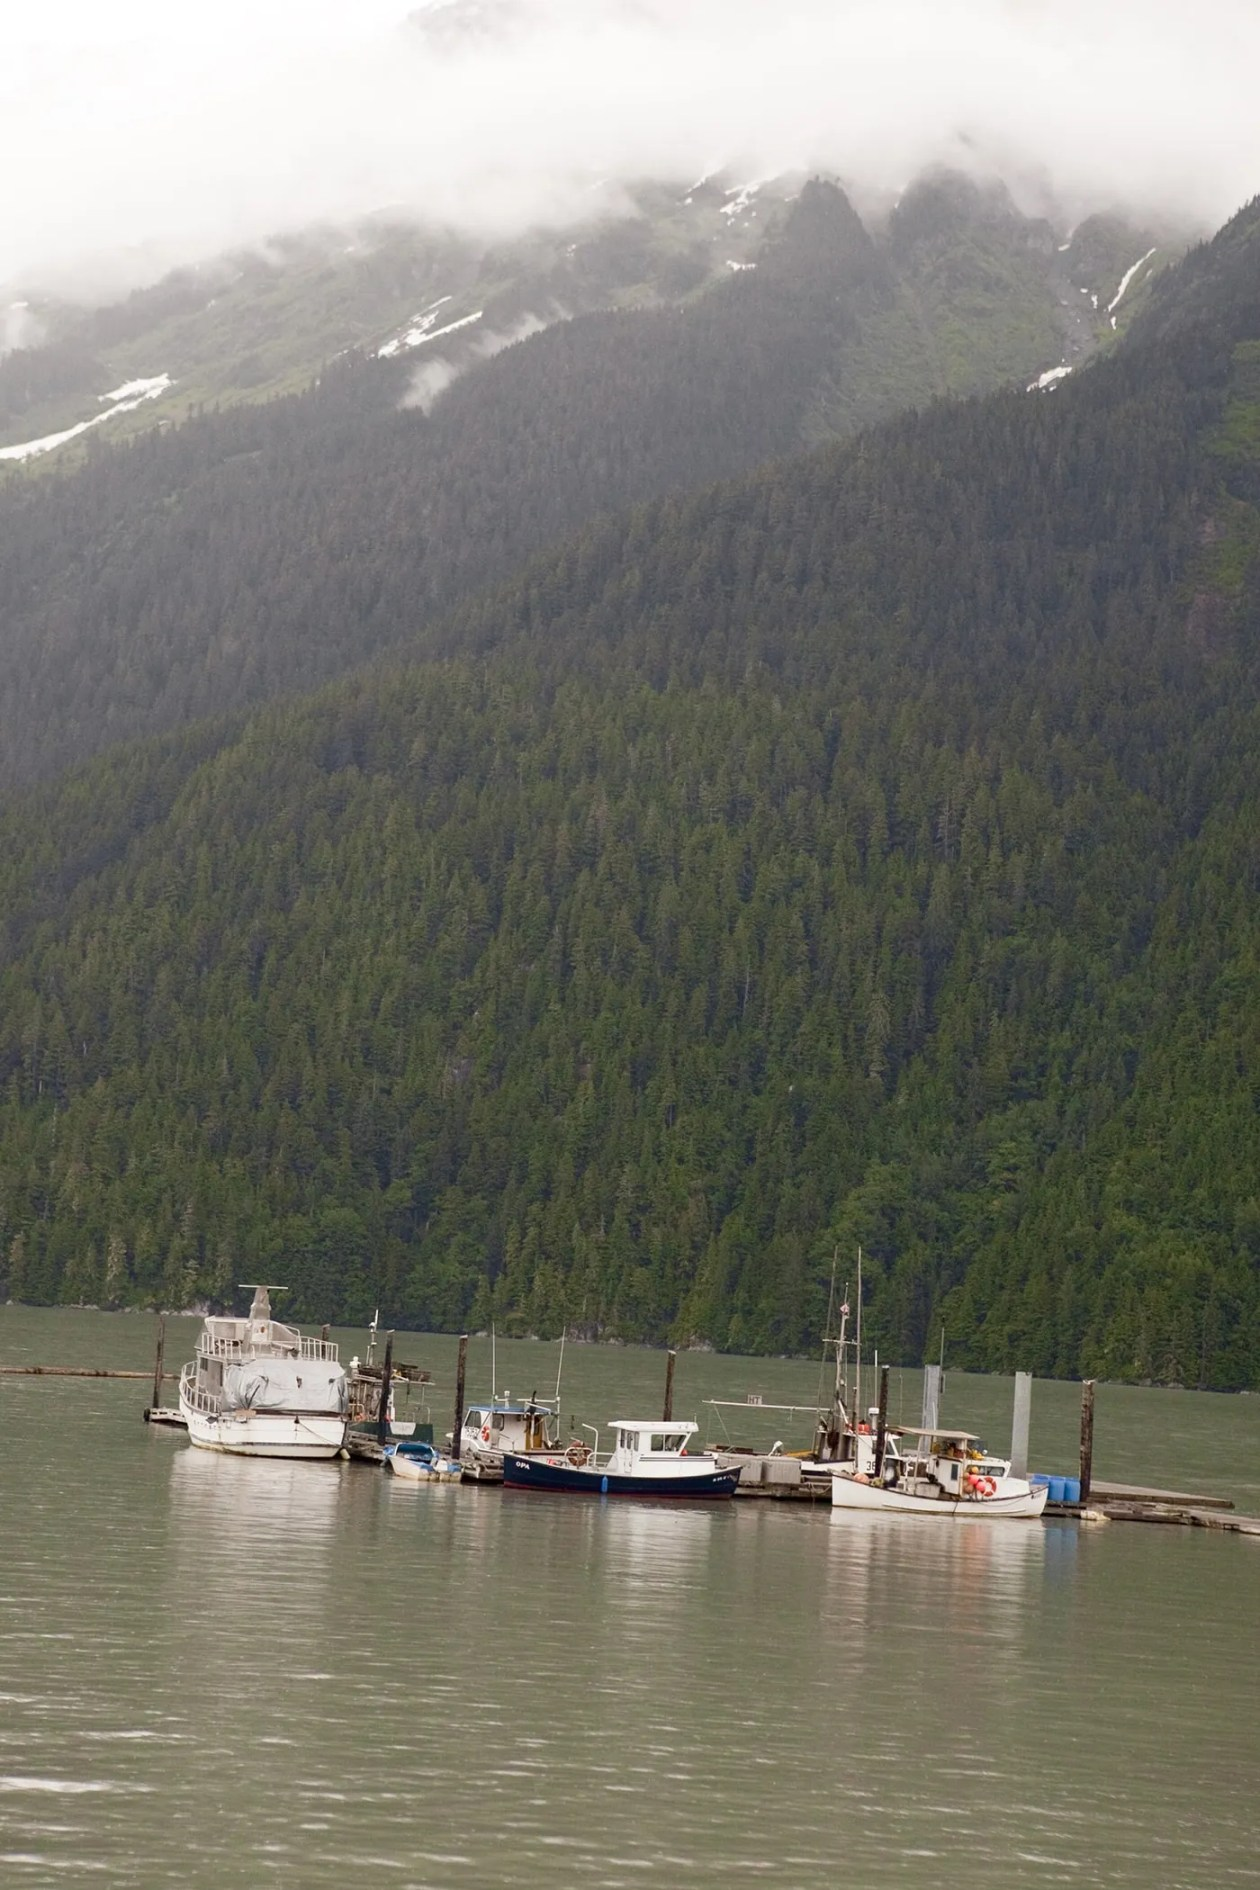 Boats near the pier in Hyder, Alaska.